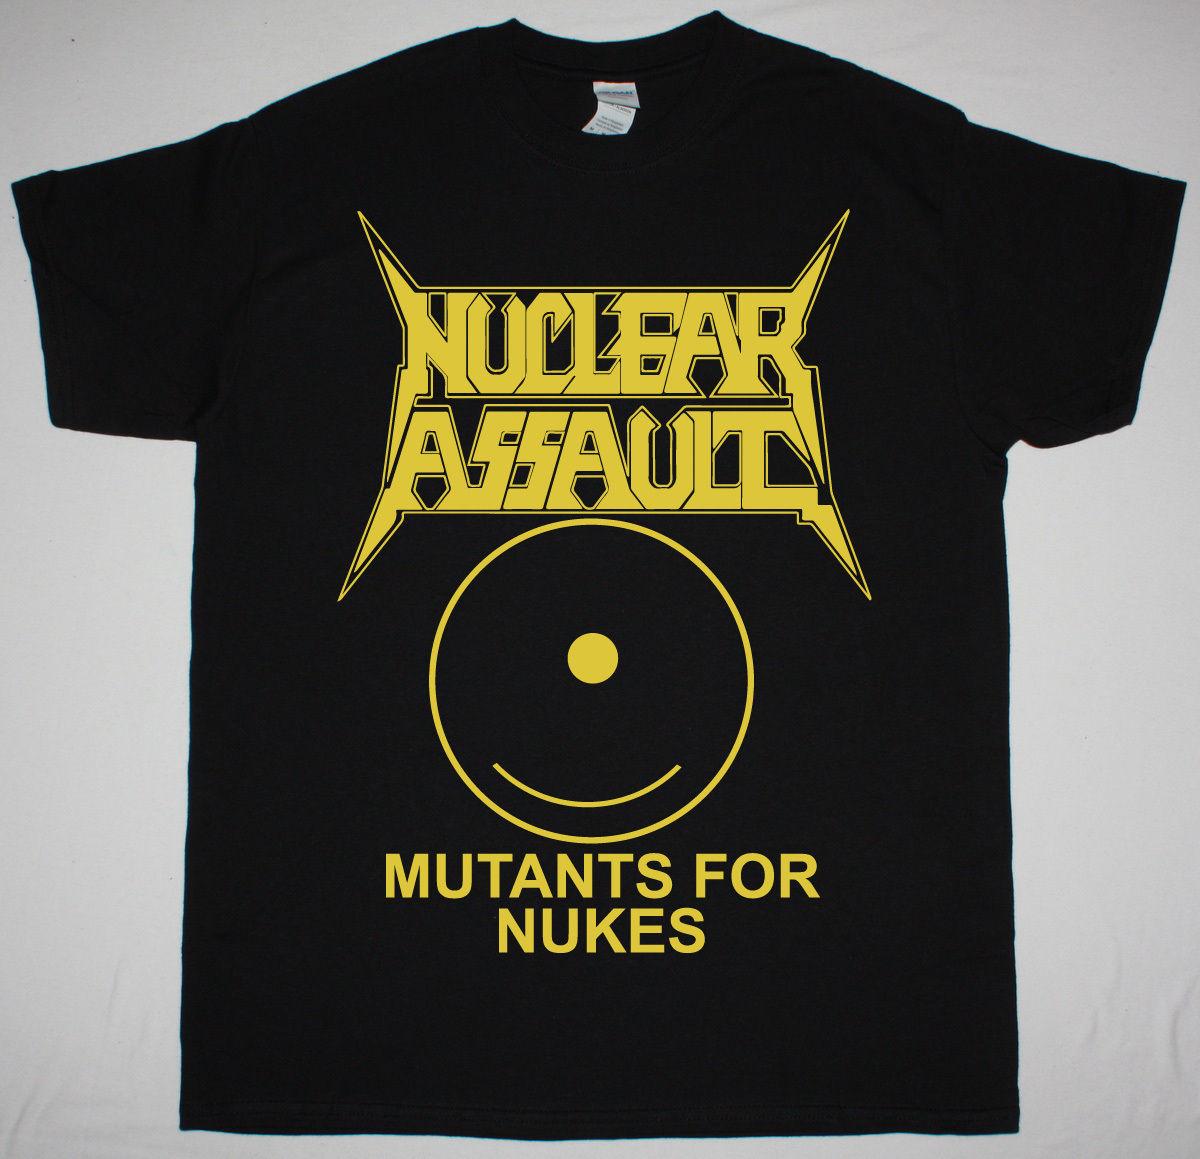 NUCLEAR ASSAULT MUTANTS FOR NUKES BLACK T SHIRT THRASH METAL CROSSOVER S.O.D. ...